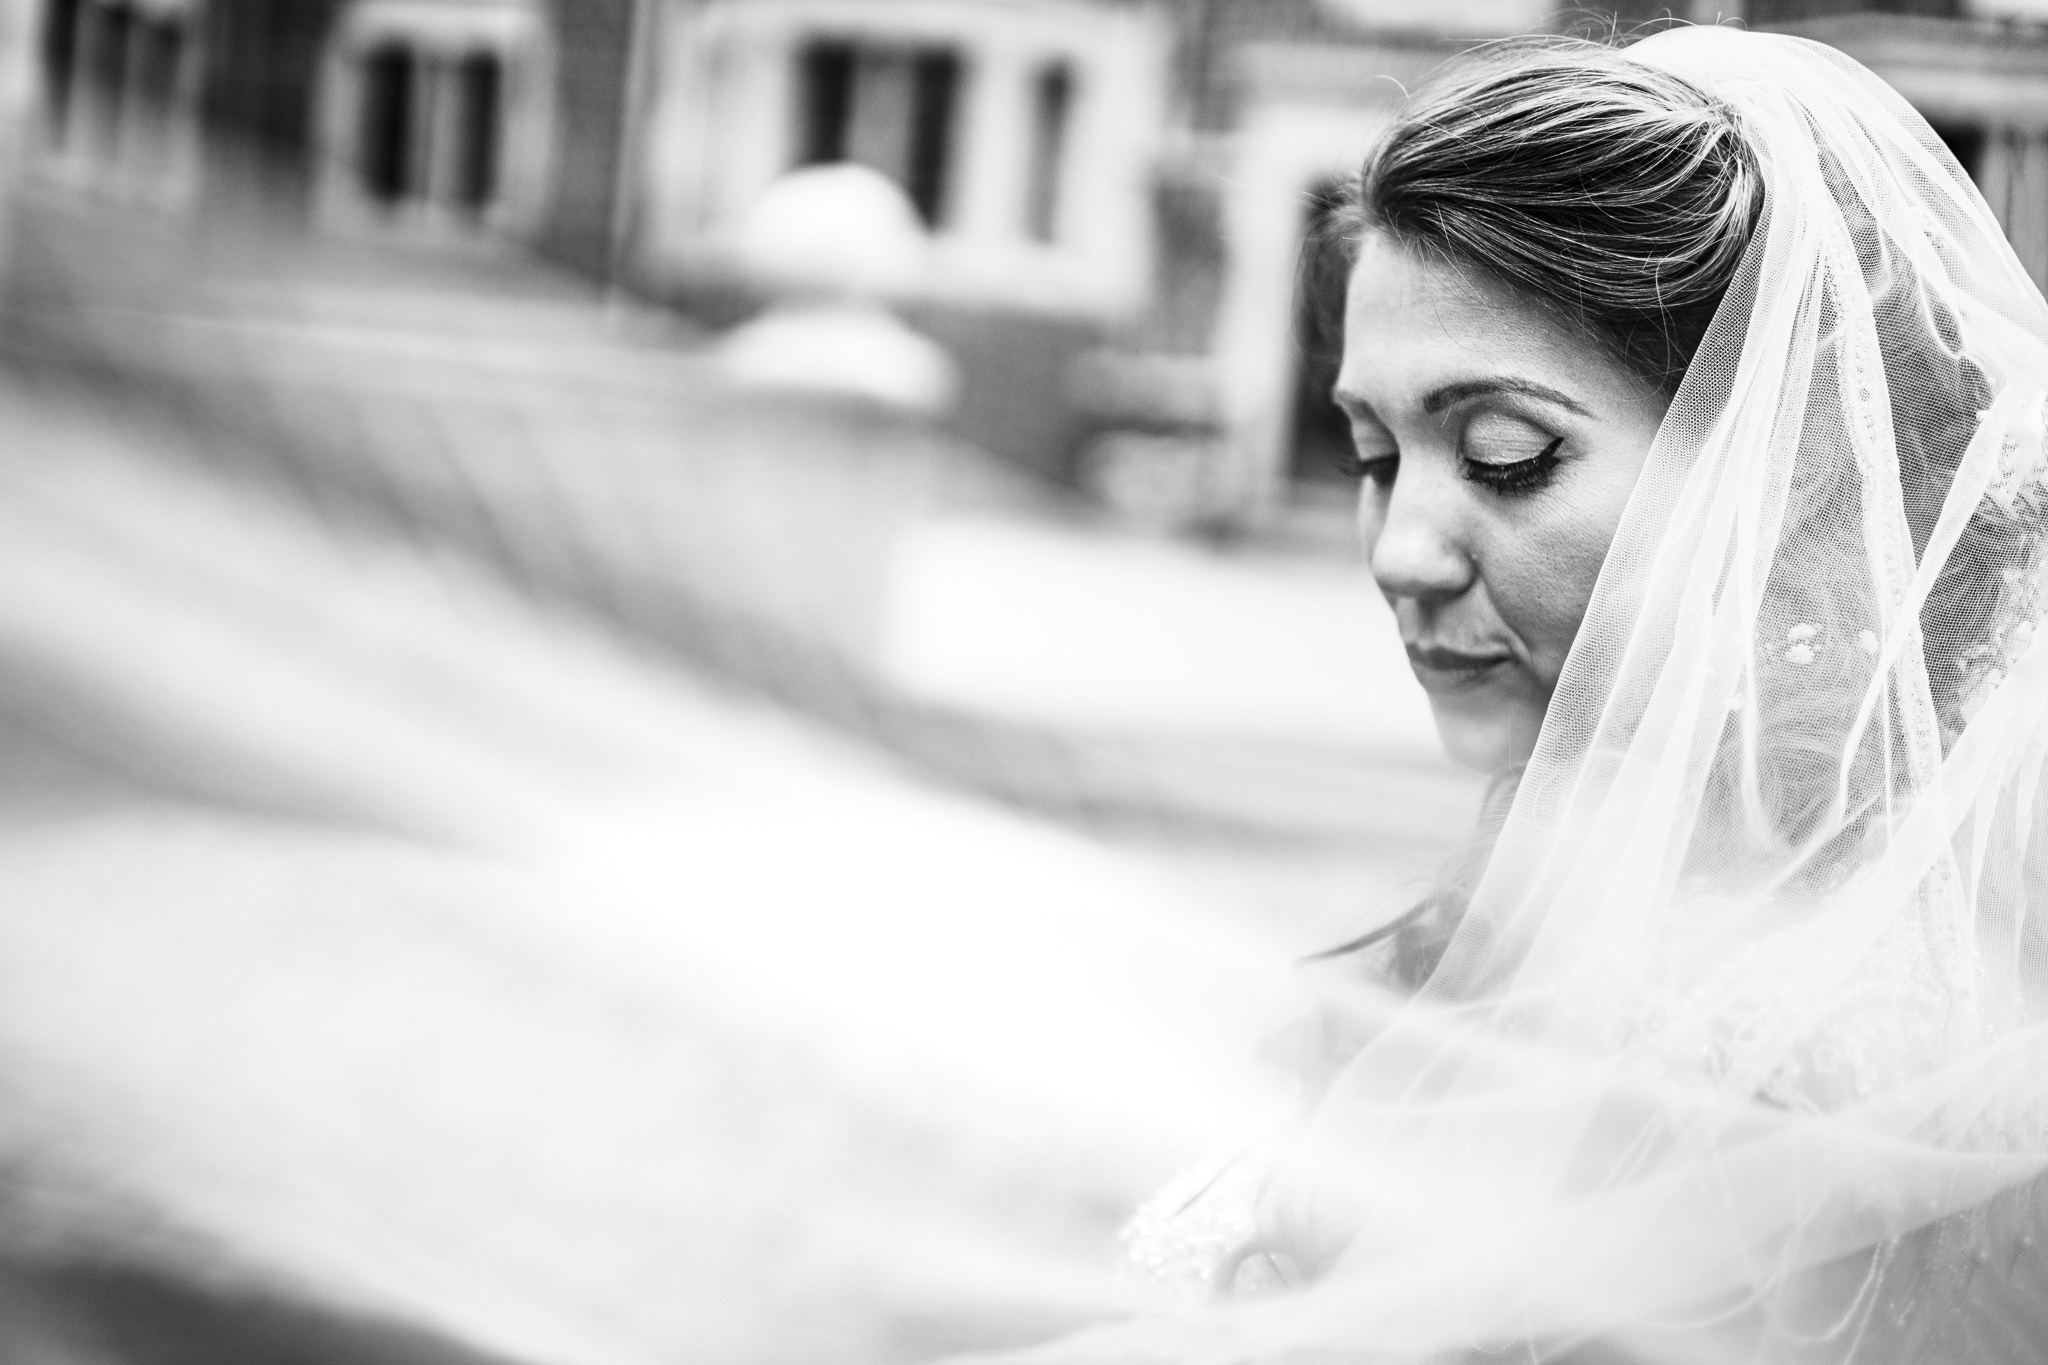 Barbato-Moorestown-Community-House-Wedding-New-Jersey-Photographer-16.JPG